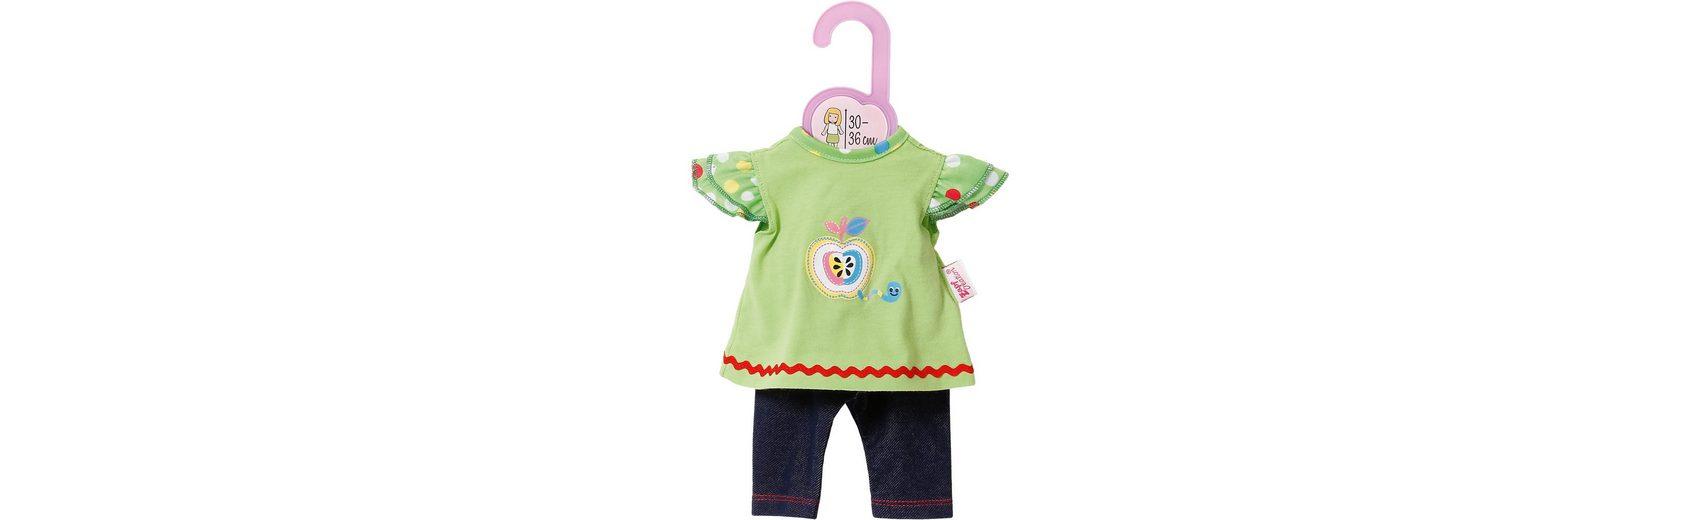 Zapf Creation Dolly Moda Shirt mit Leggings 30-36 cm